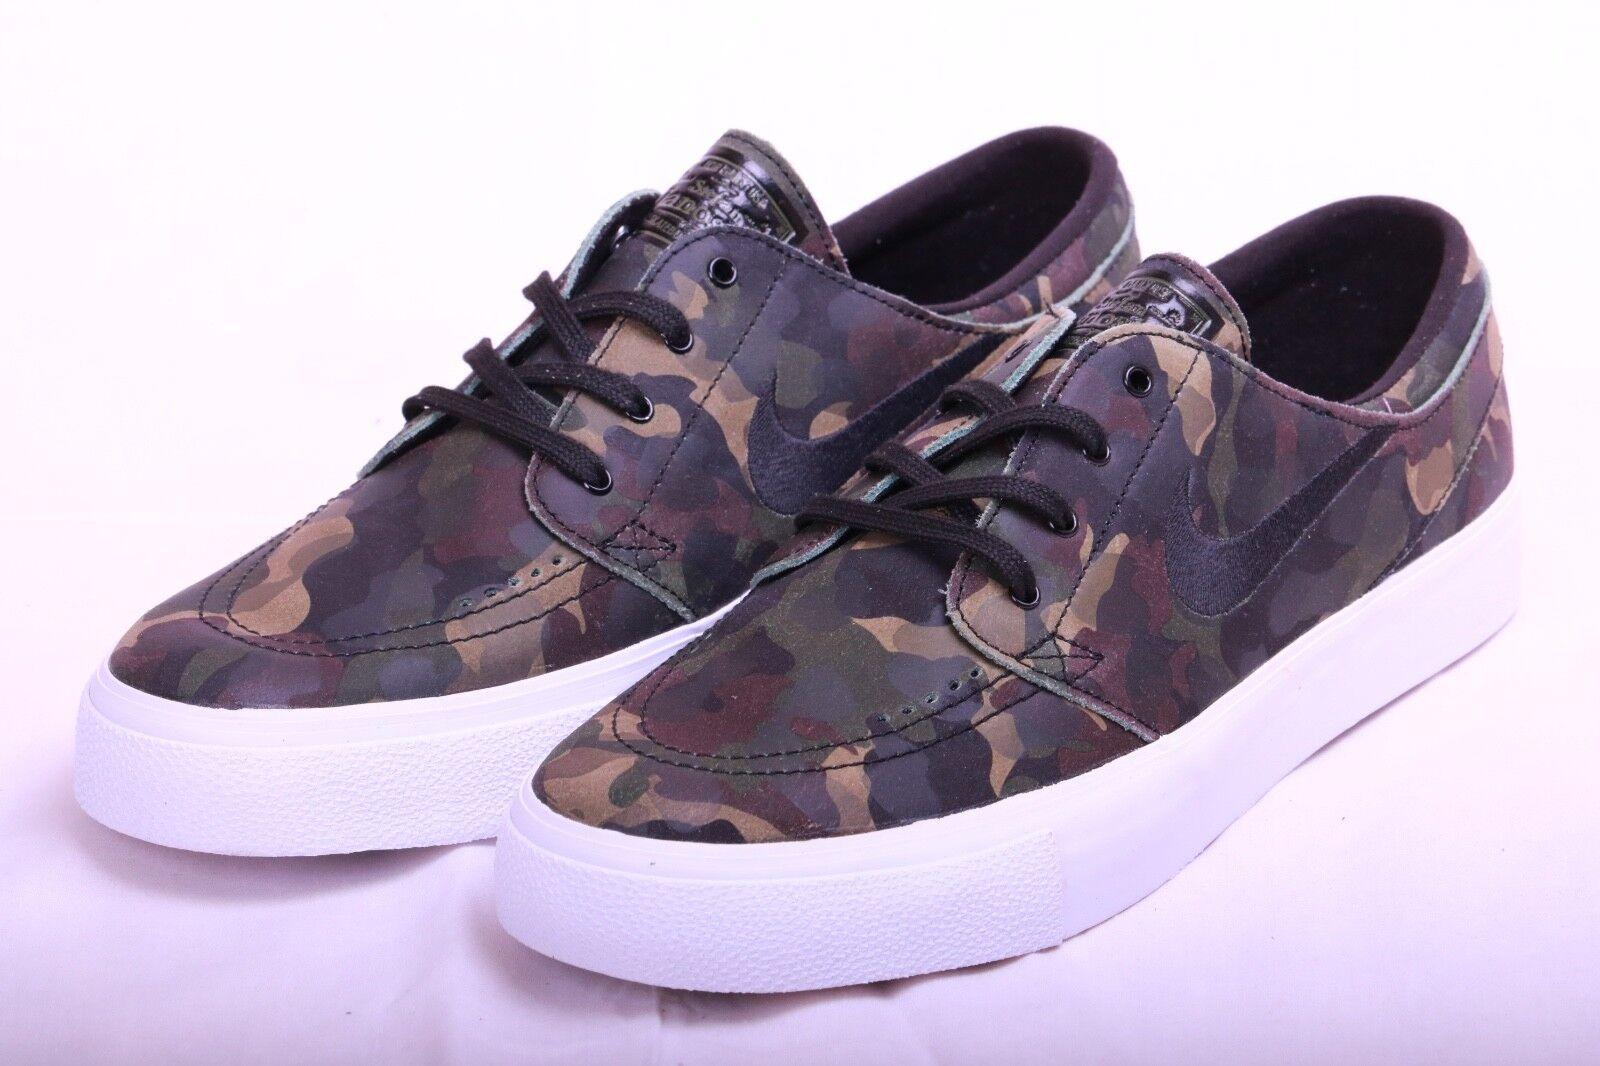 Men's Nike SB Zoom Stefan Janoski High Premium High Janoski Tape Shoes 854321 101 Size 10.5 39eb03